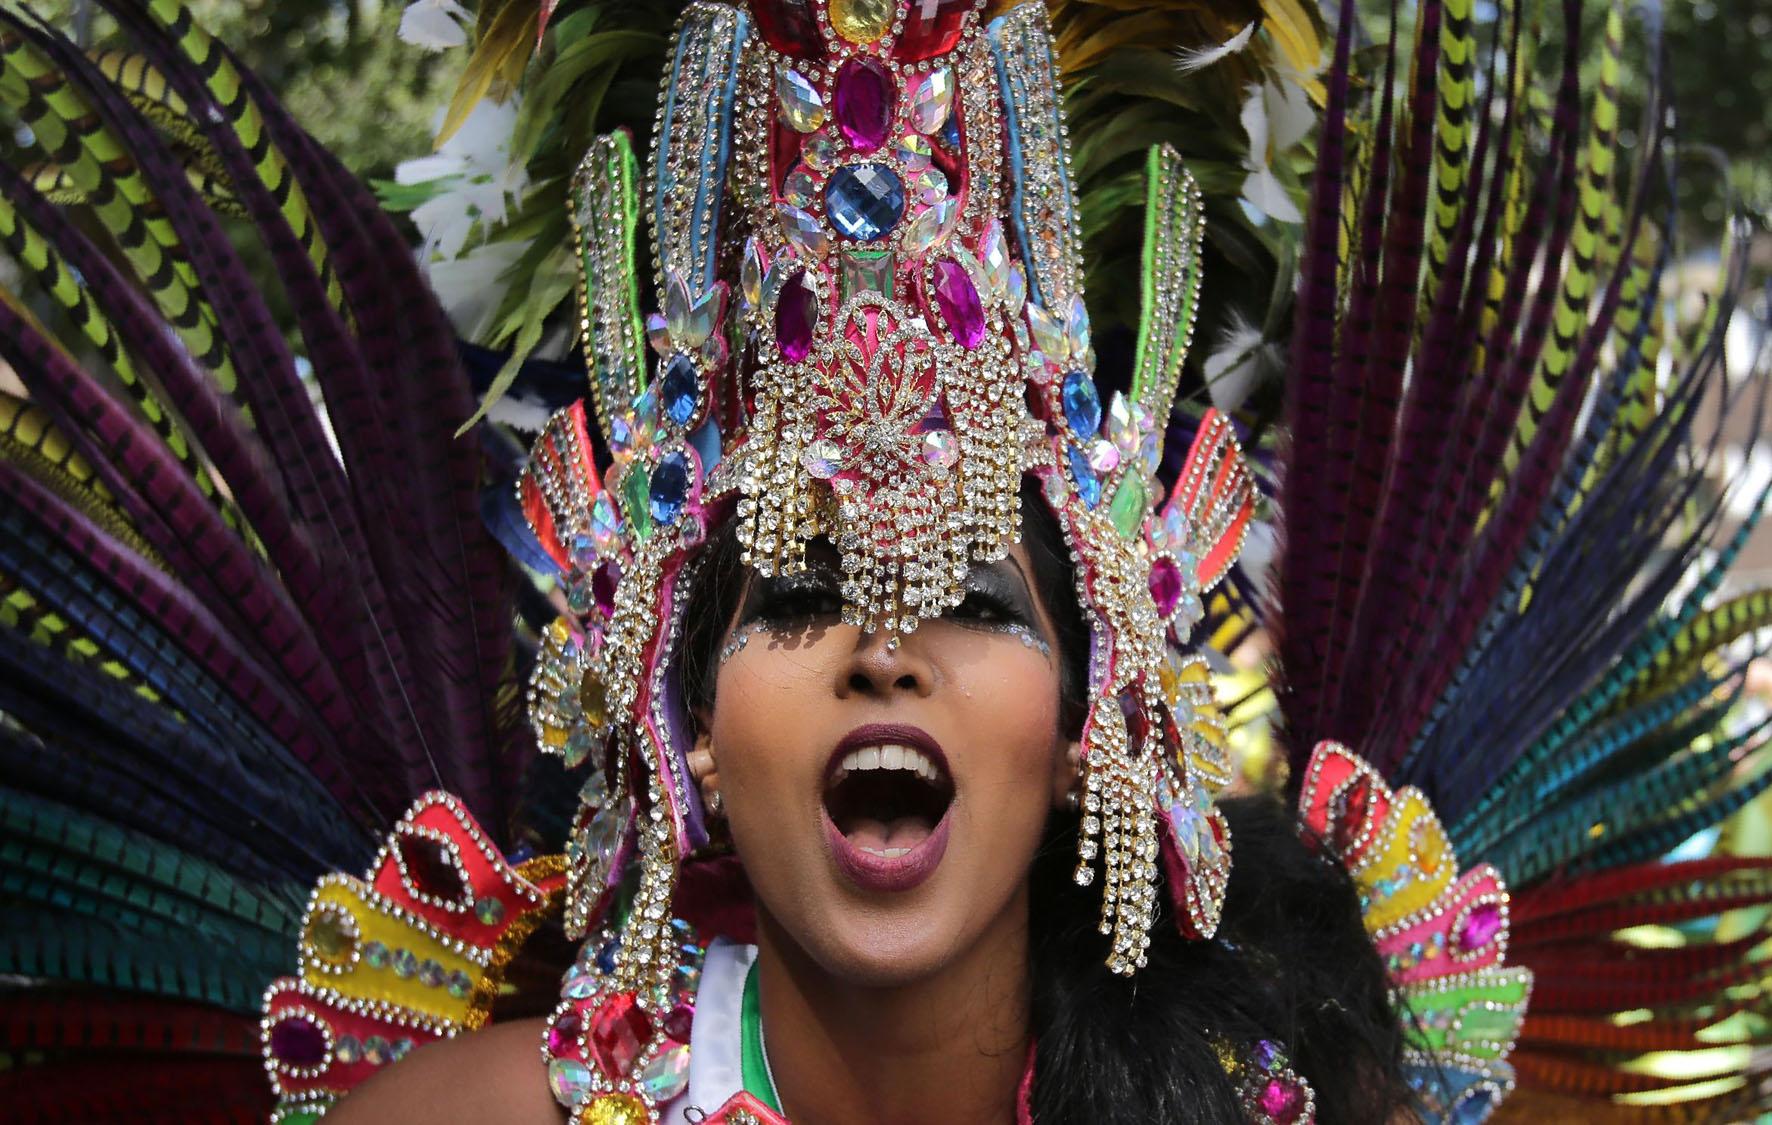 Caribbean Culture: BRITAIN-LIFESTYLE-CARNIVAL